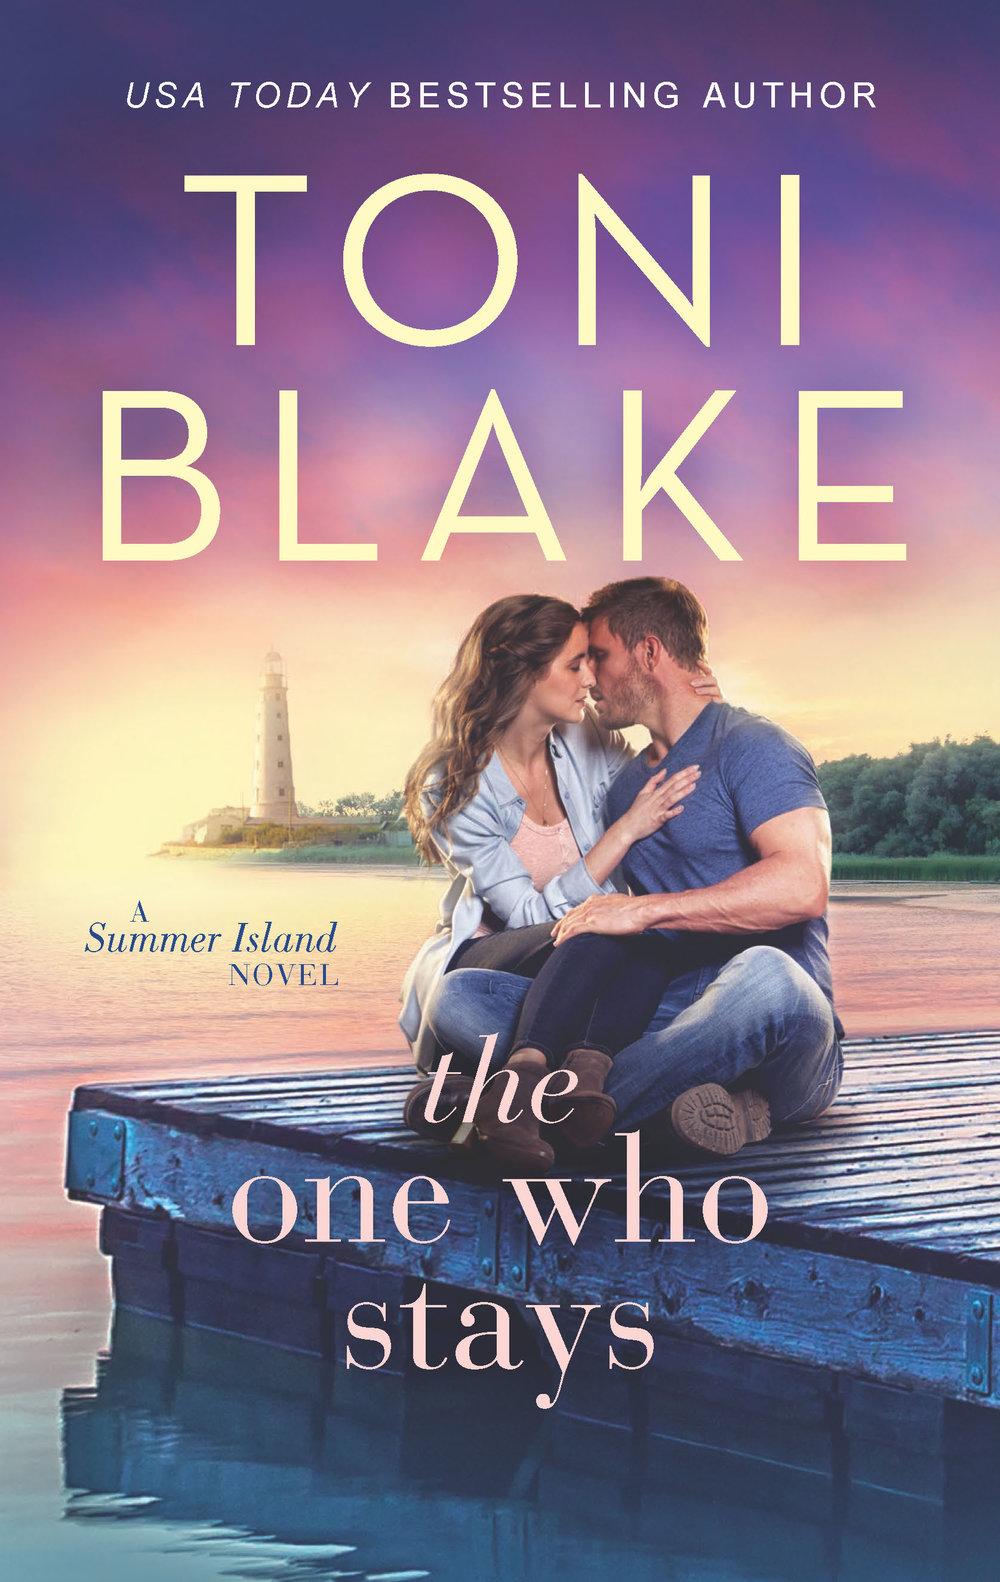 Summer Island, Book 1 July 30, 2019